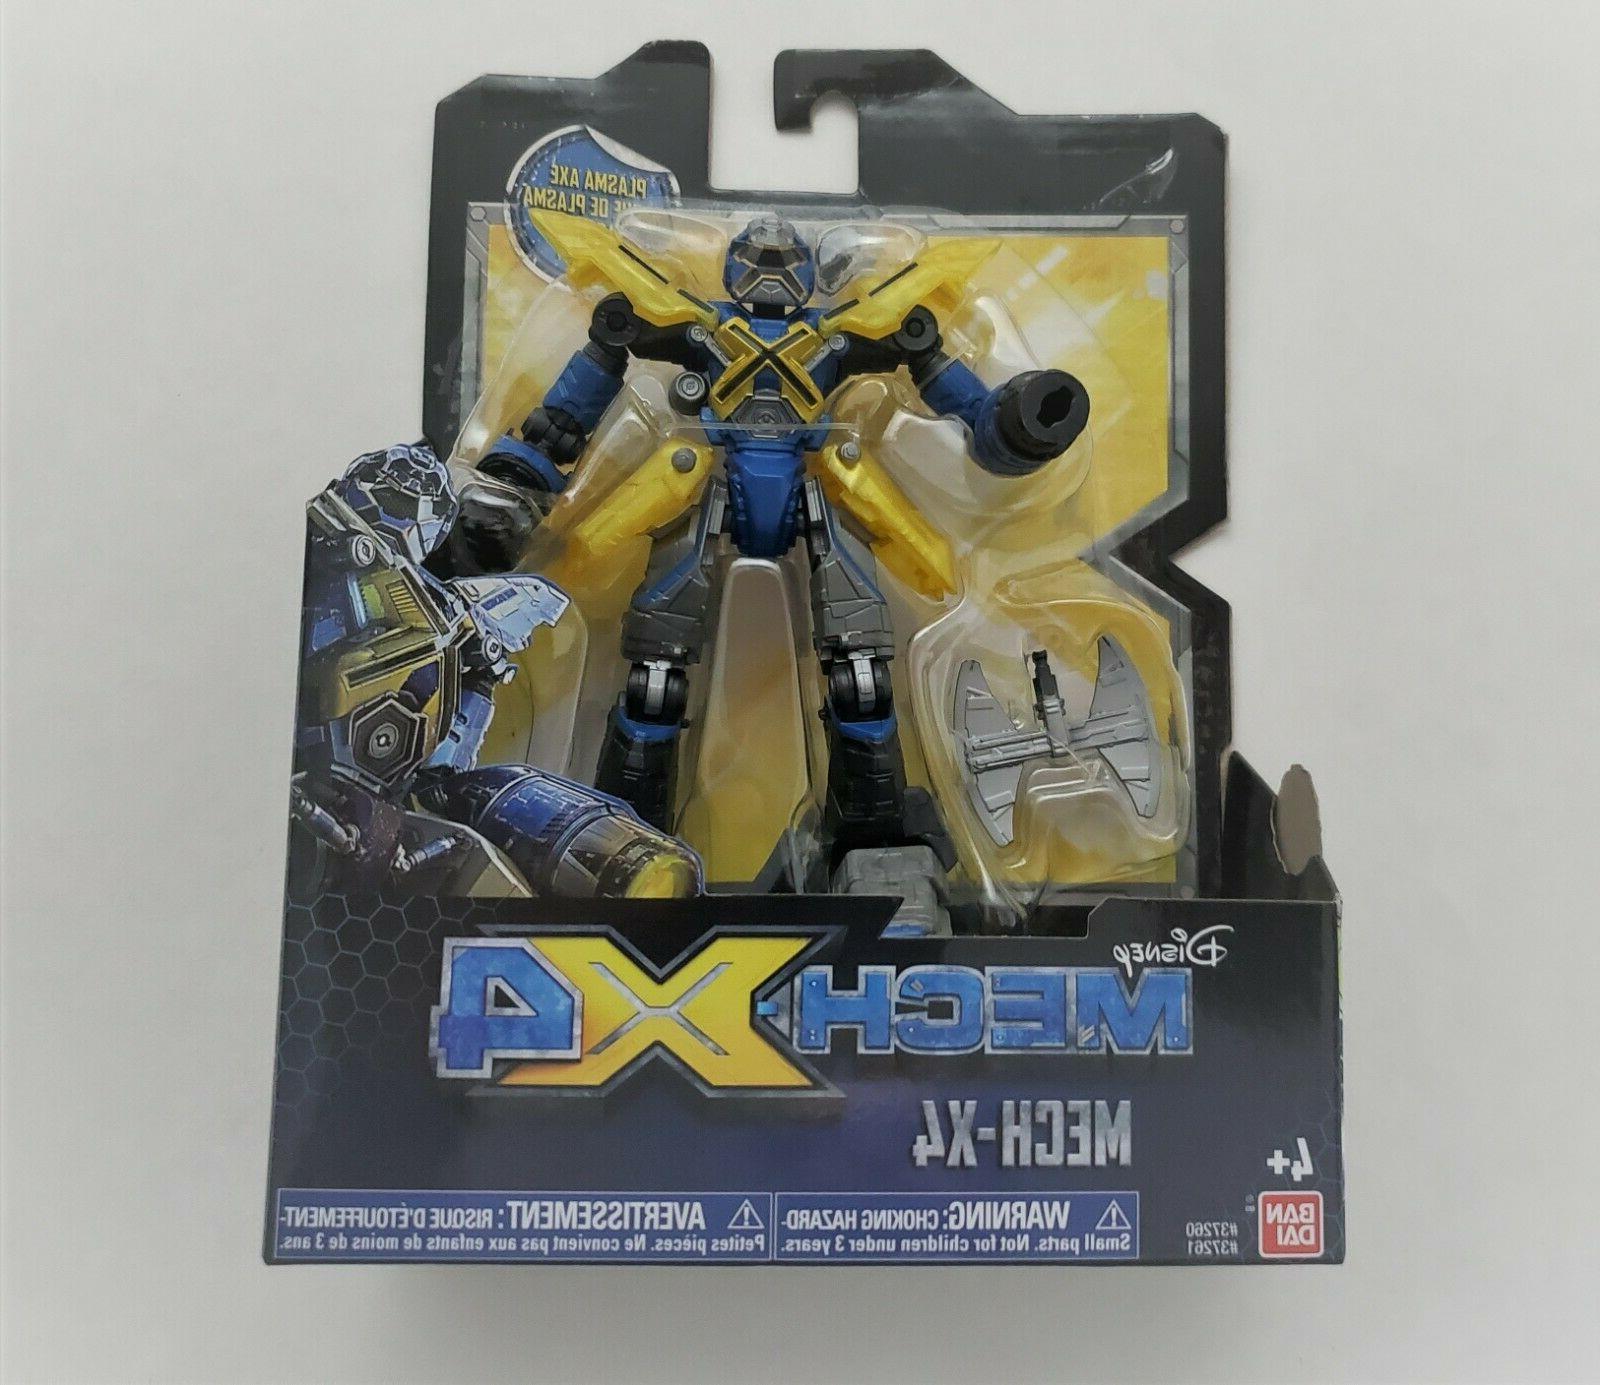 mech x4 5 robot with plasma axe